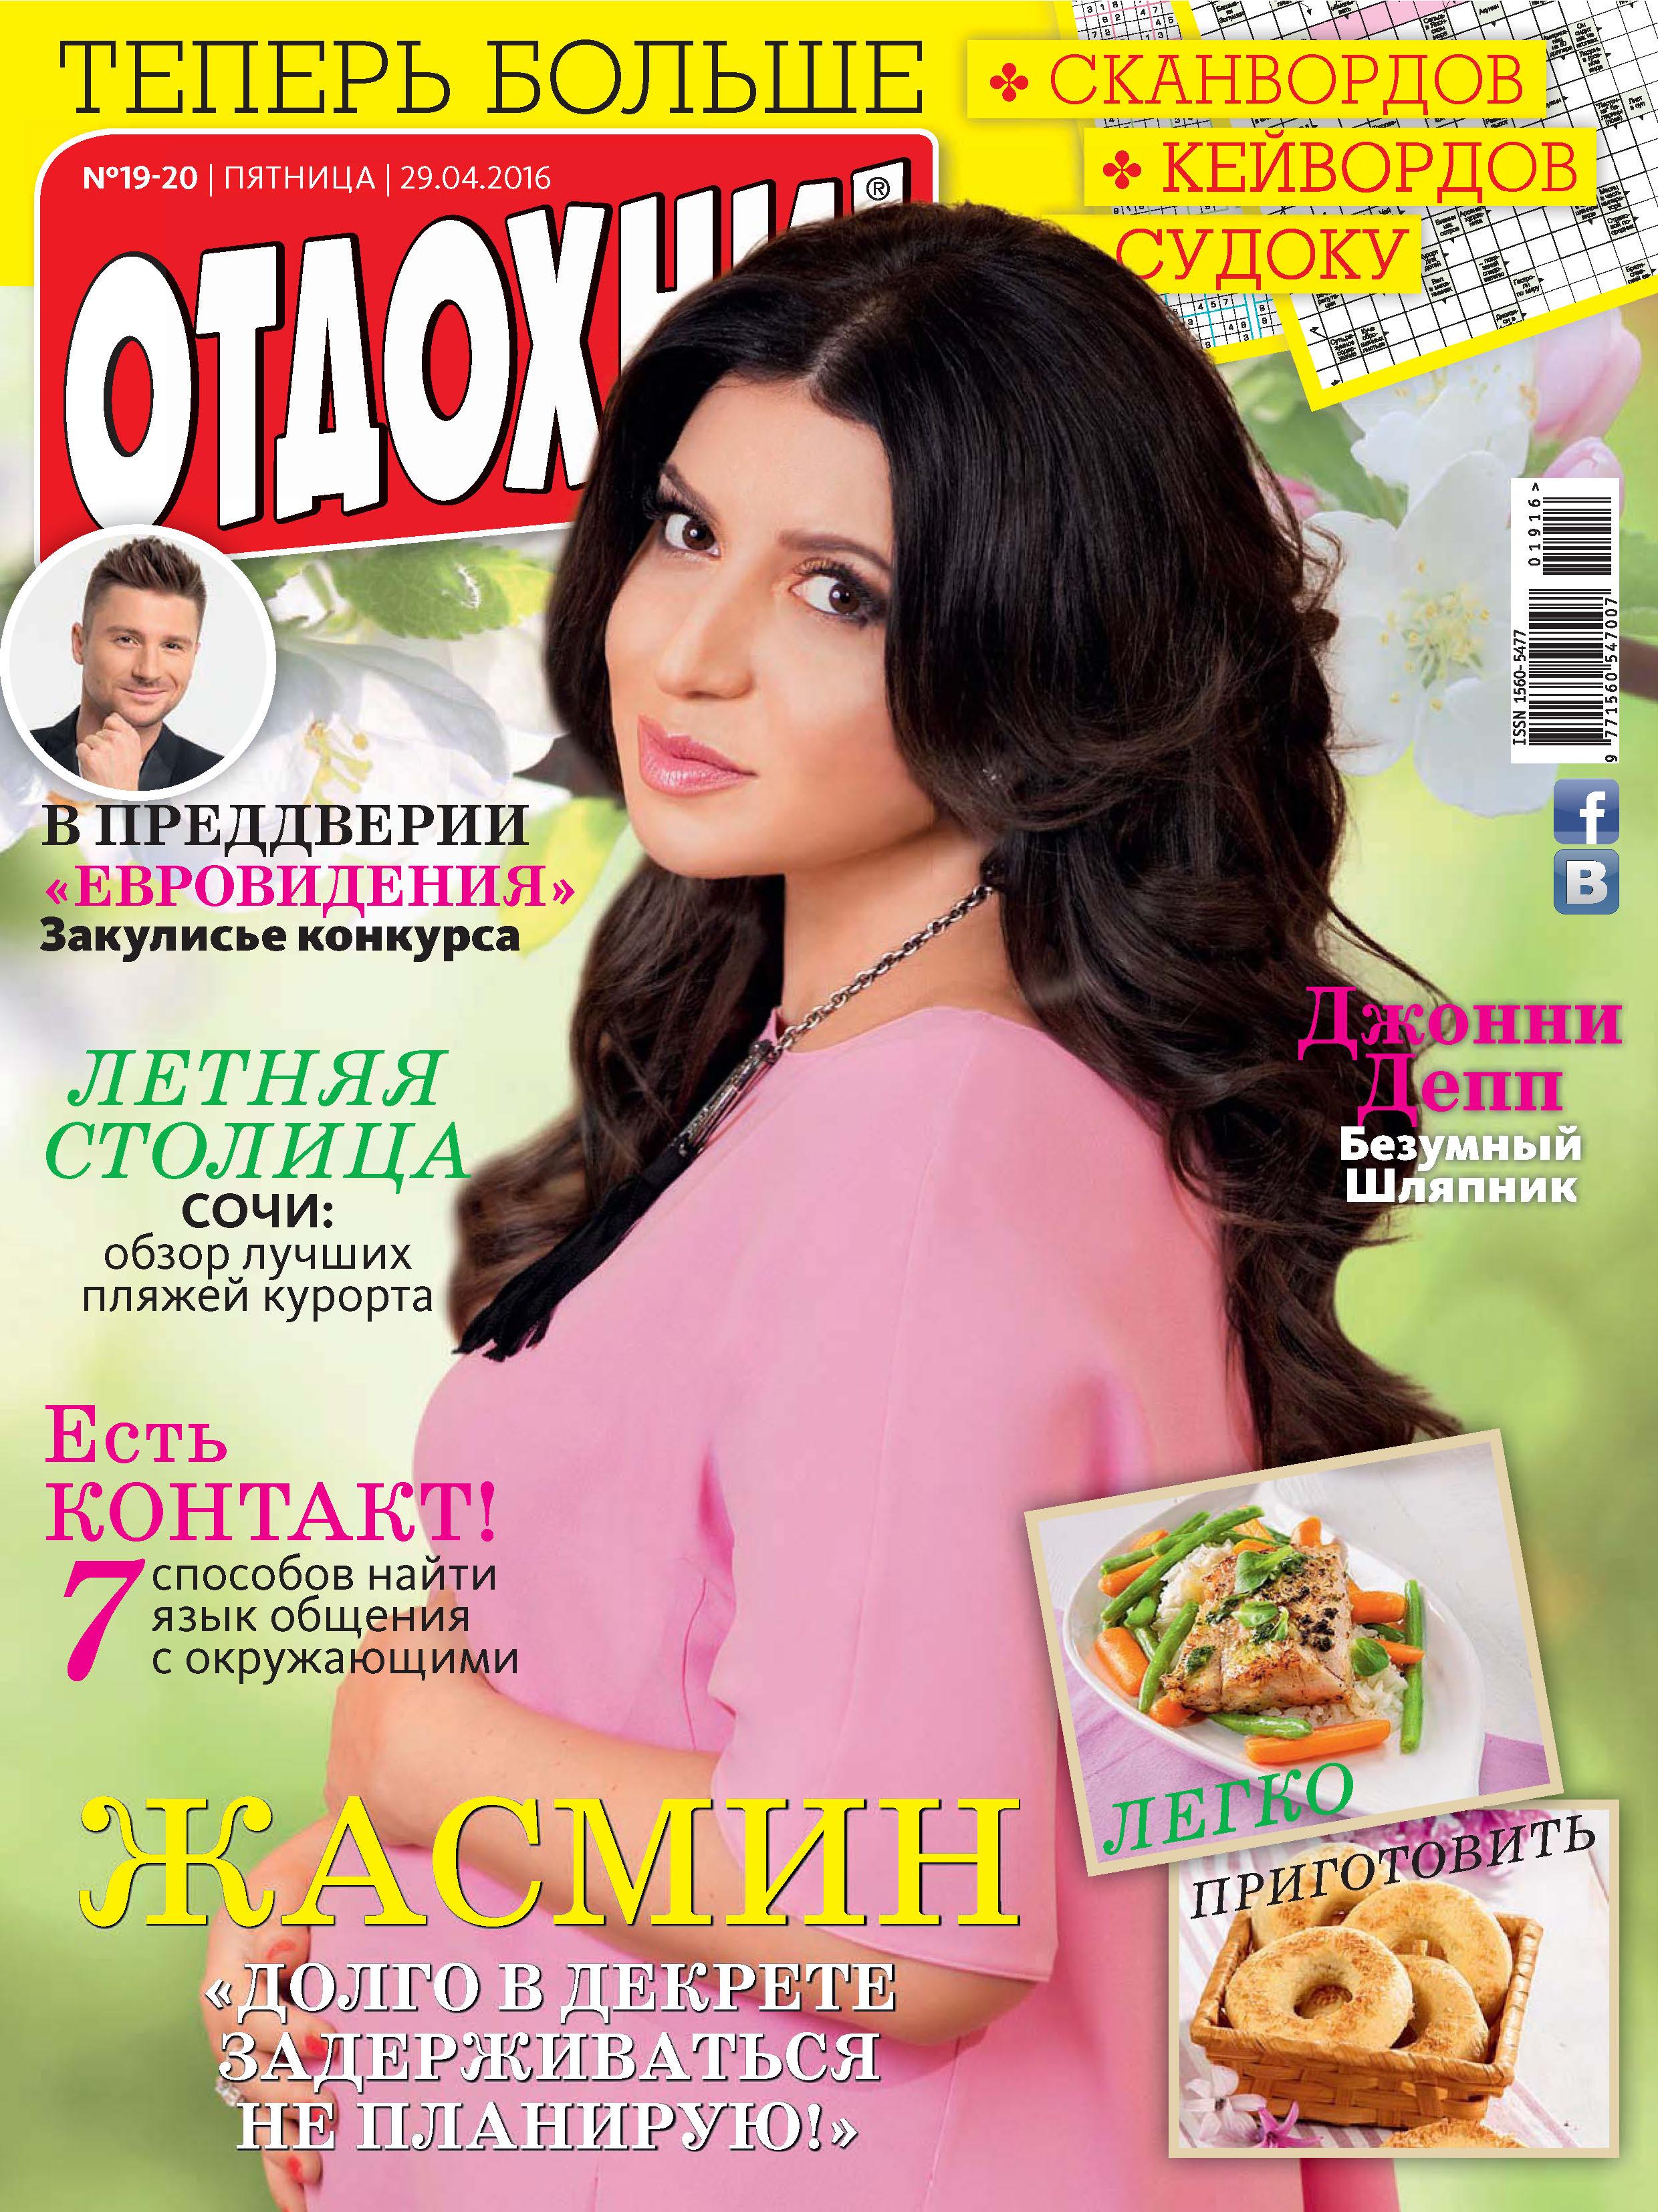 ИД «Бурда» Журнал «Отдохни!» №19-20/2016 ид бурда журнал отдохни 07 2016